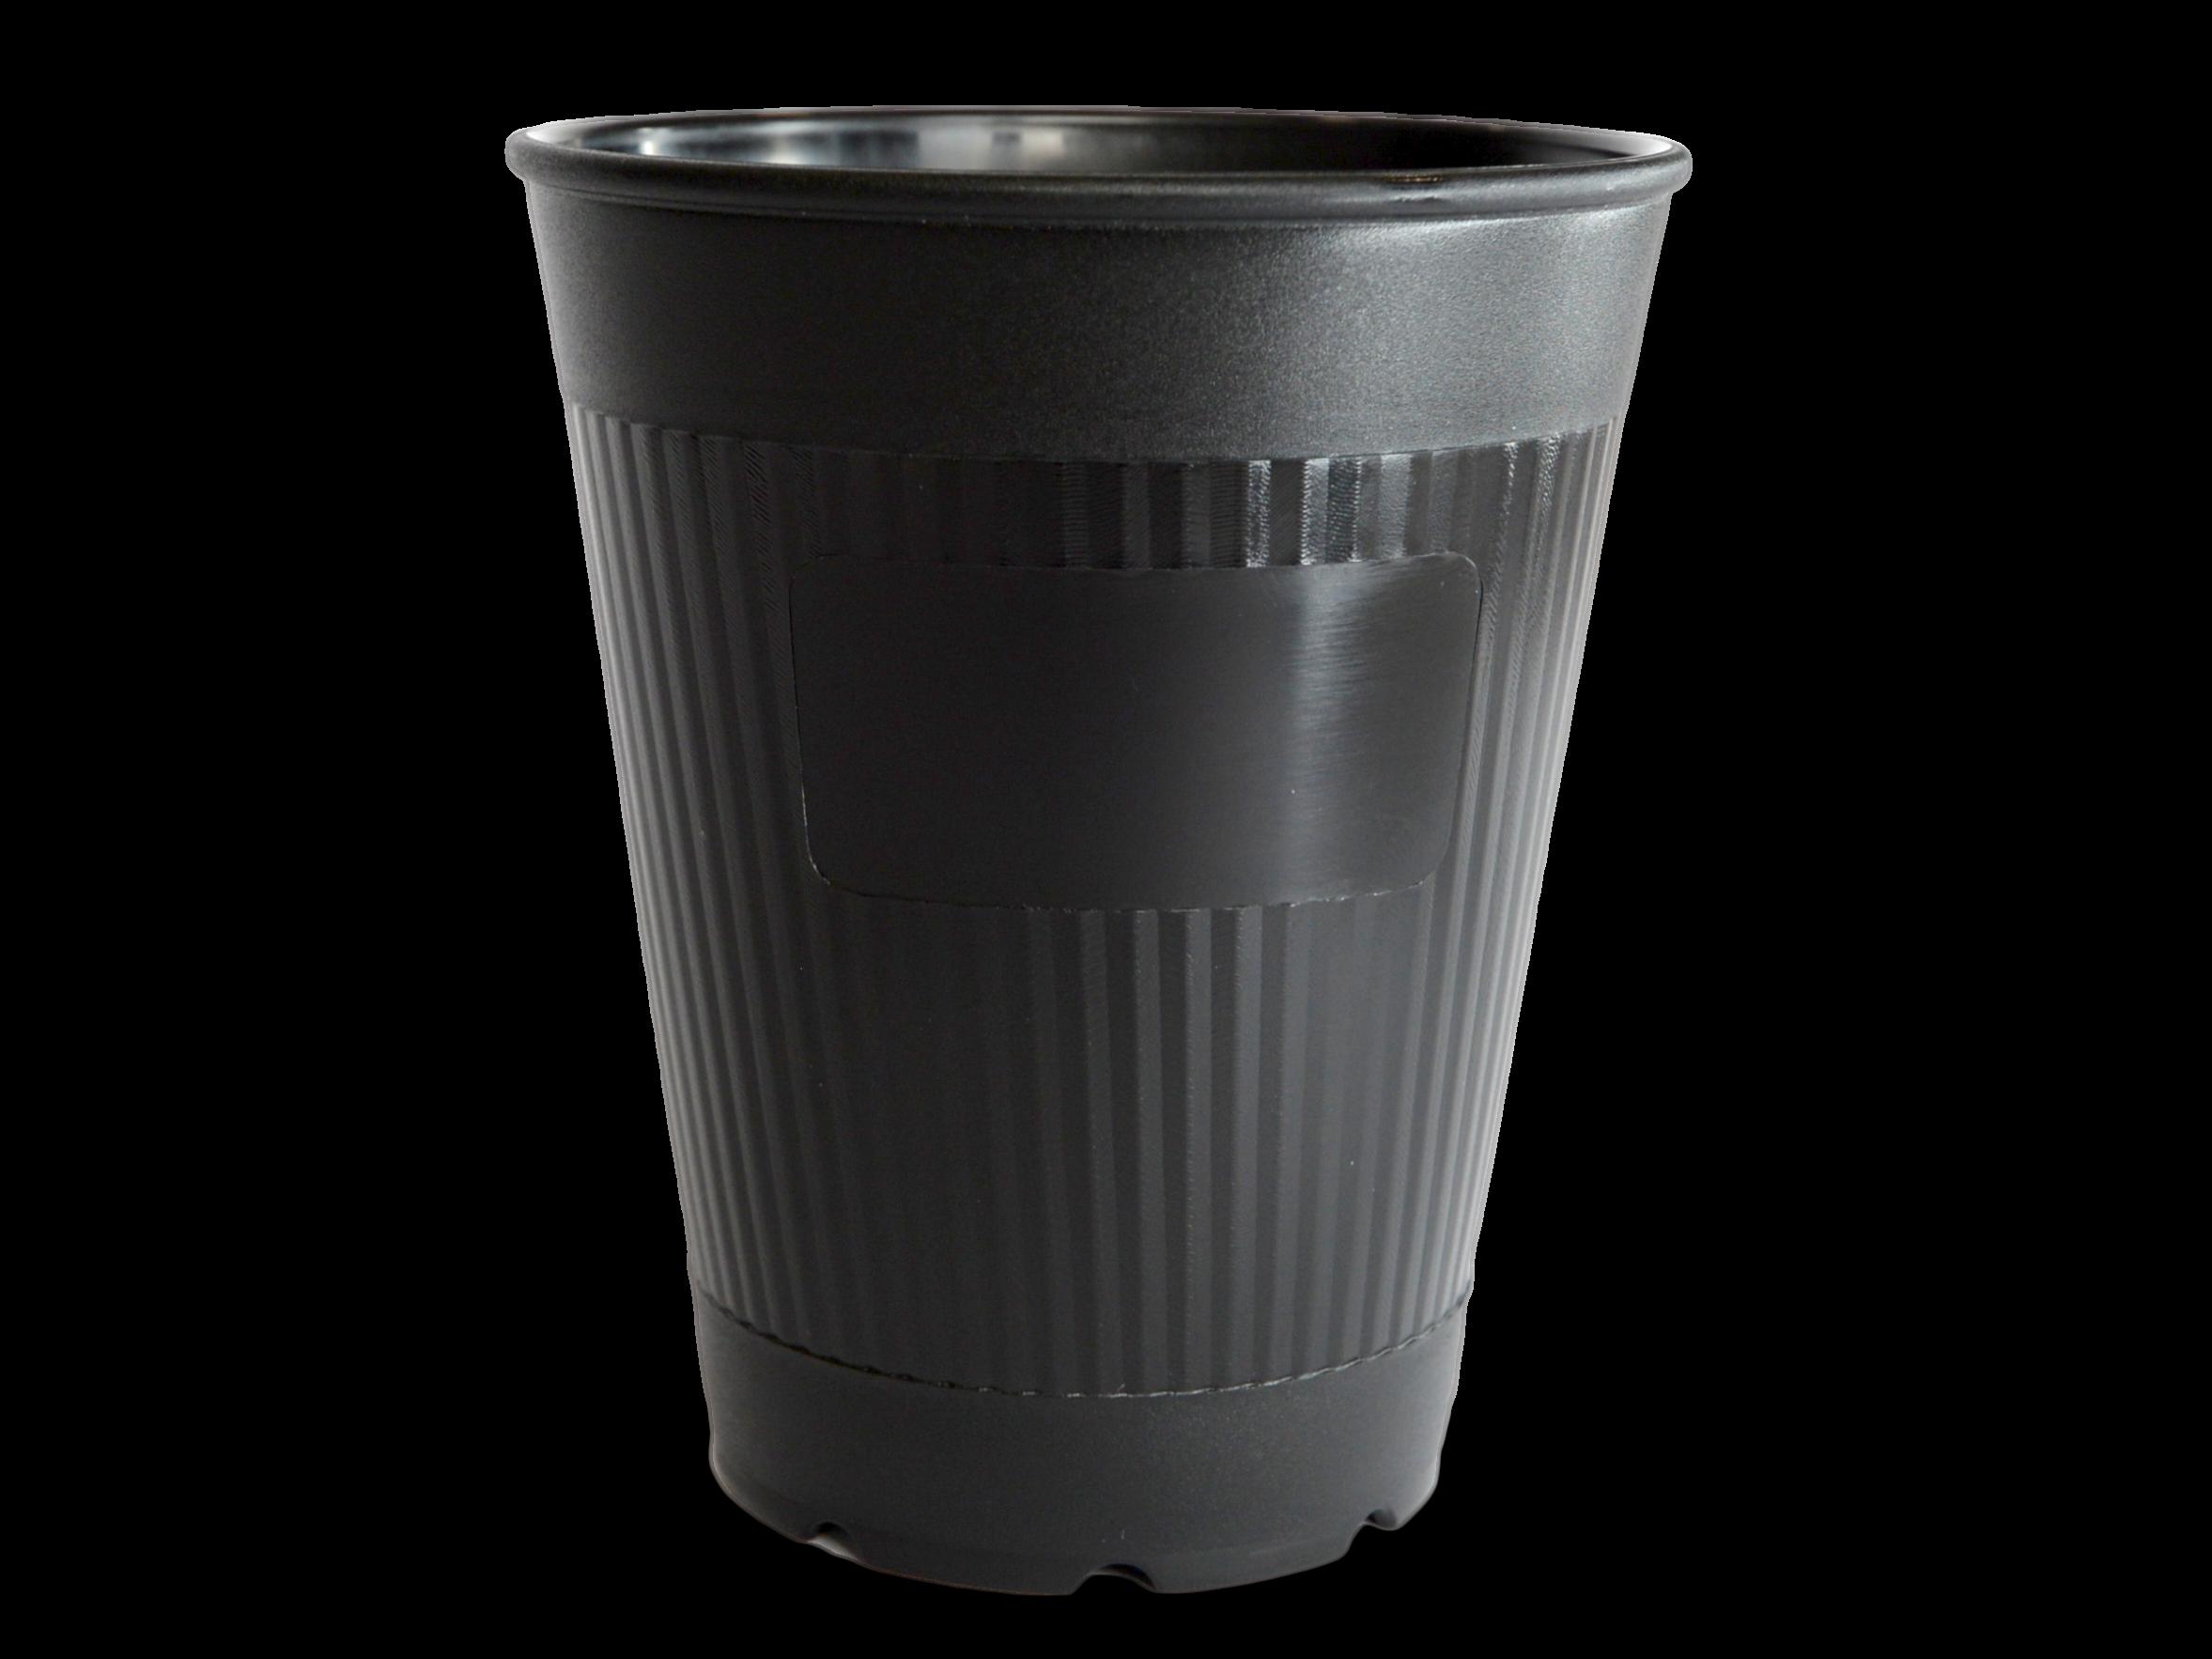 Pfandbecher Kaffee to go; Mehrwegsystem Kaffee to go; Systembecher; Automat